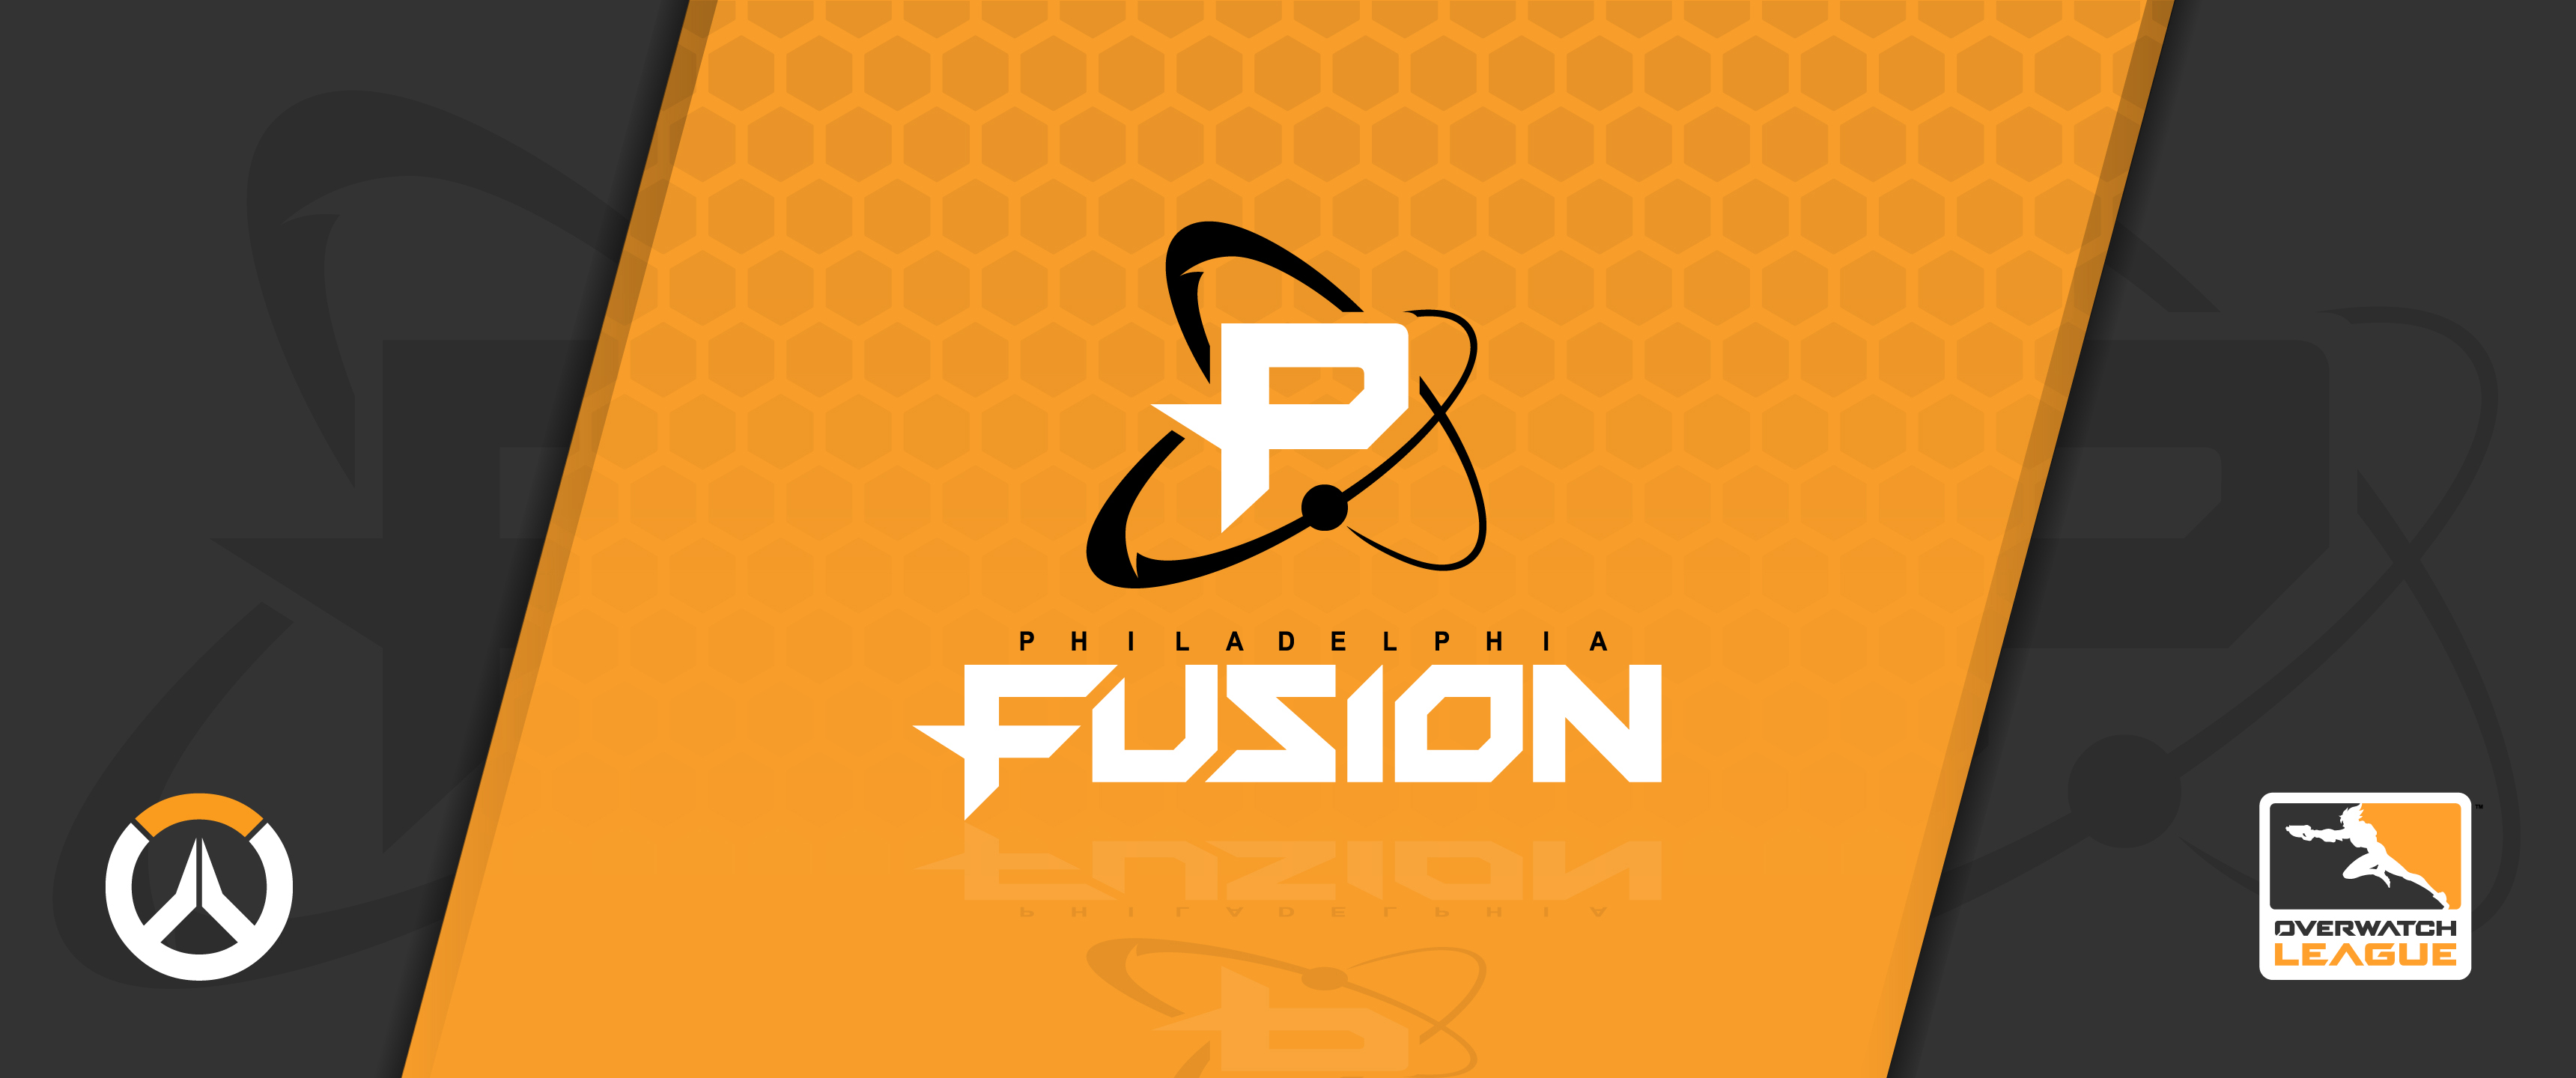 Overwatch League - Philadelphia Fusion 2 by SBX611 on DeviantArt